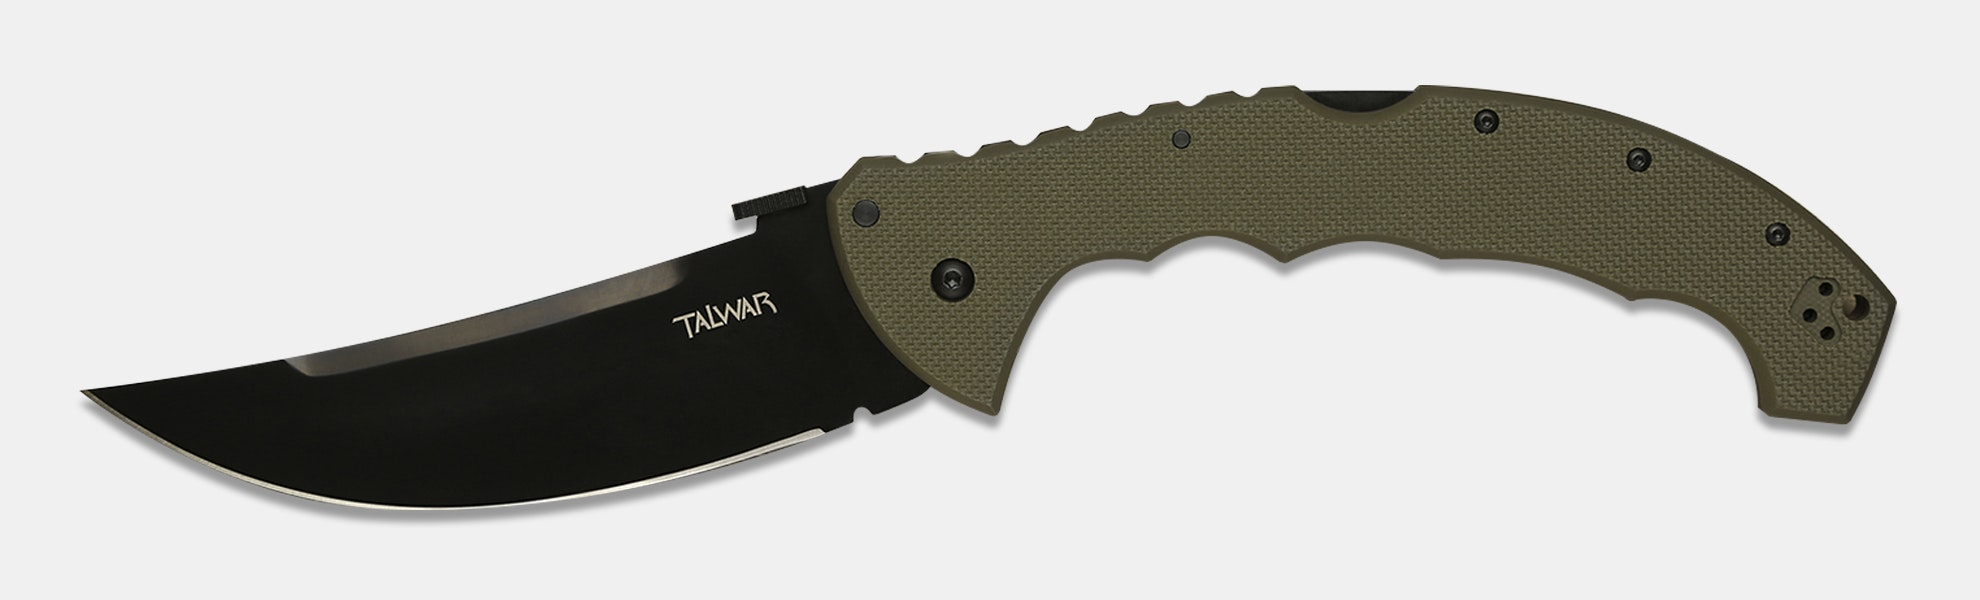 Cold Steel Talwar 5.5-inch Trailing Point Folder